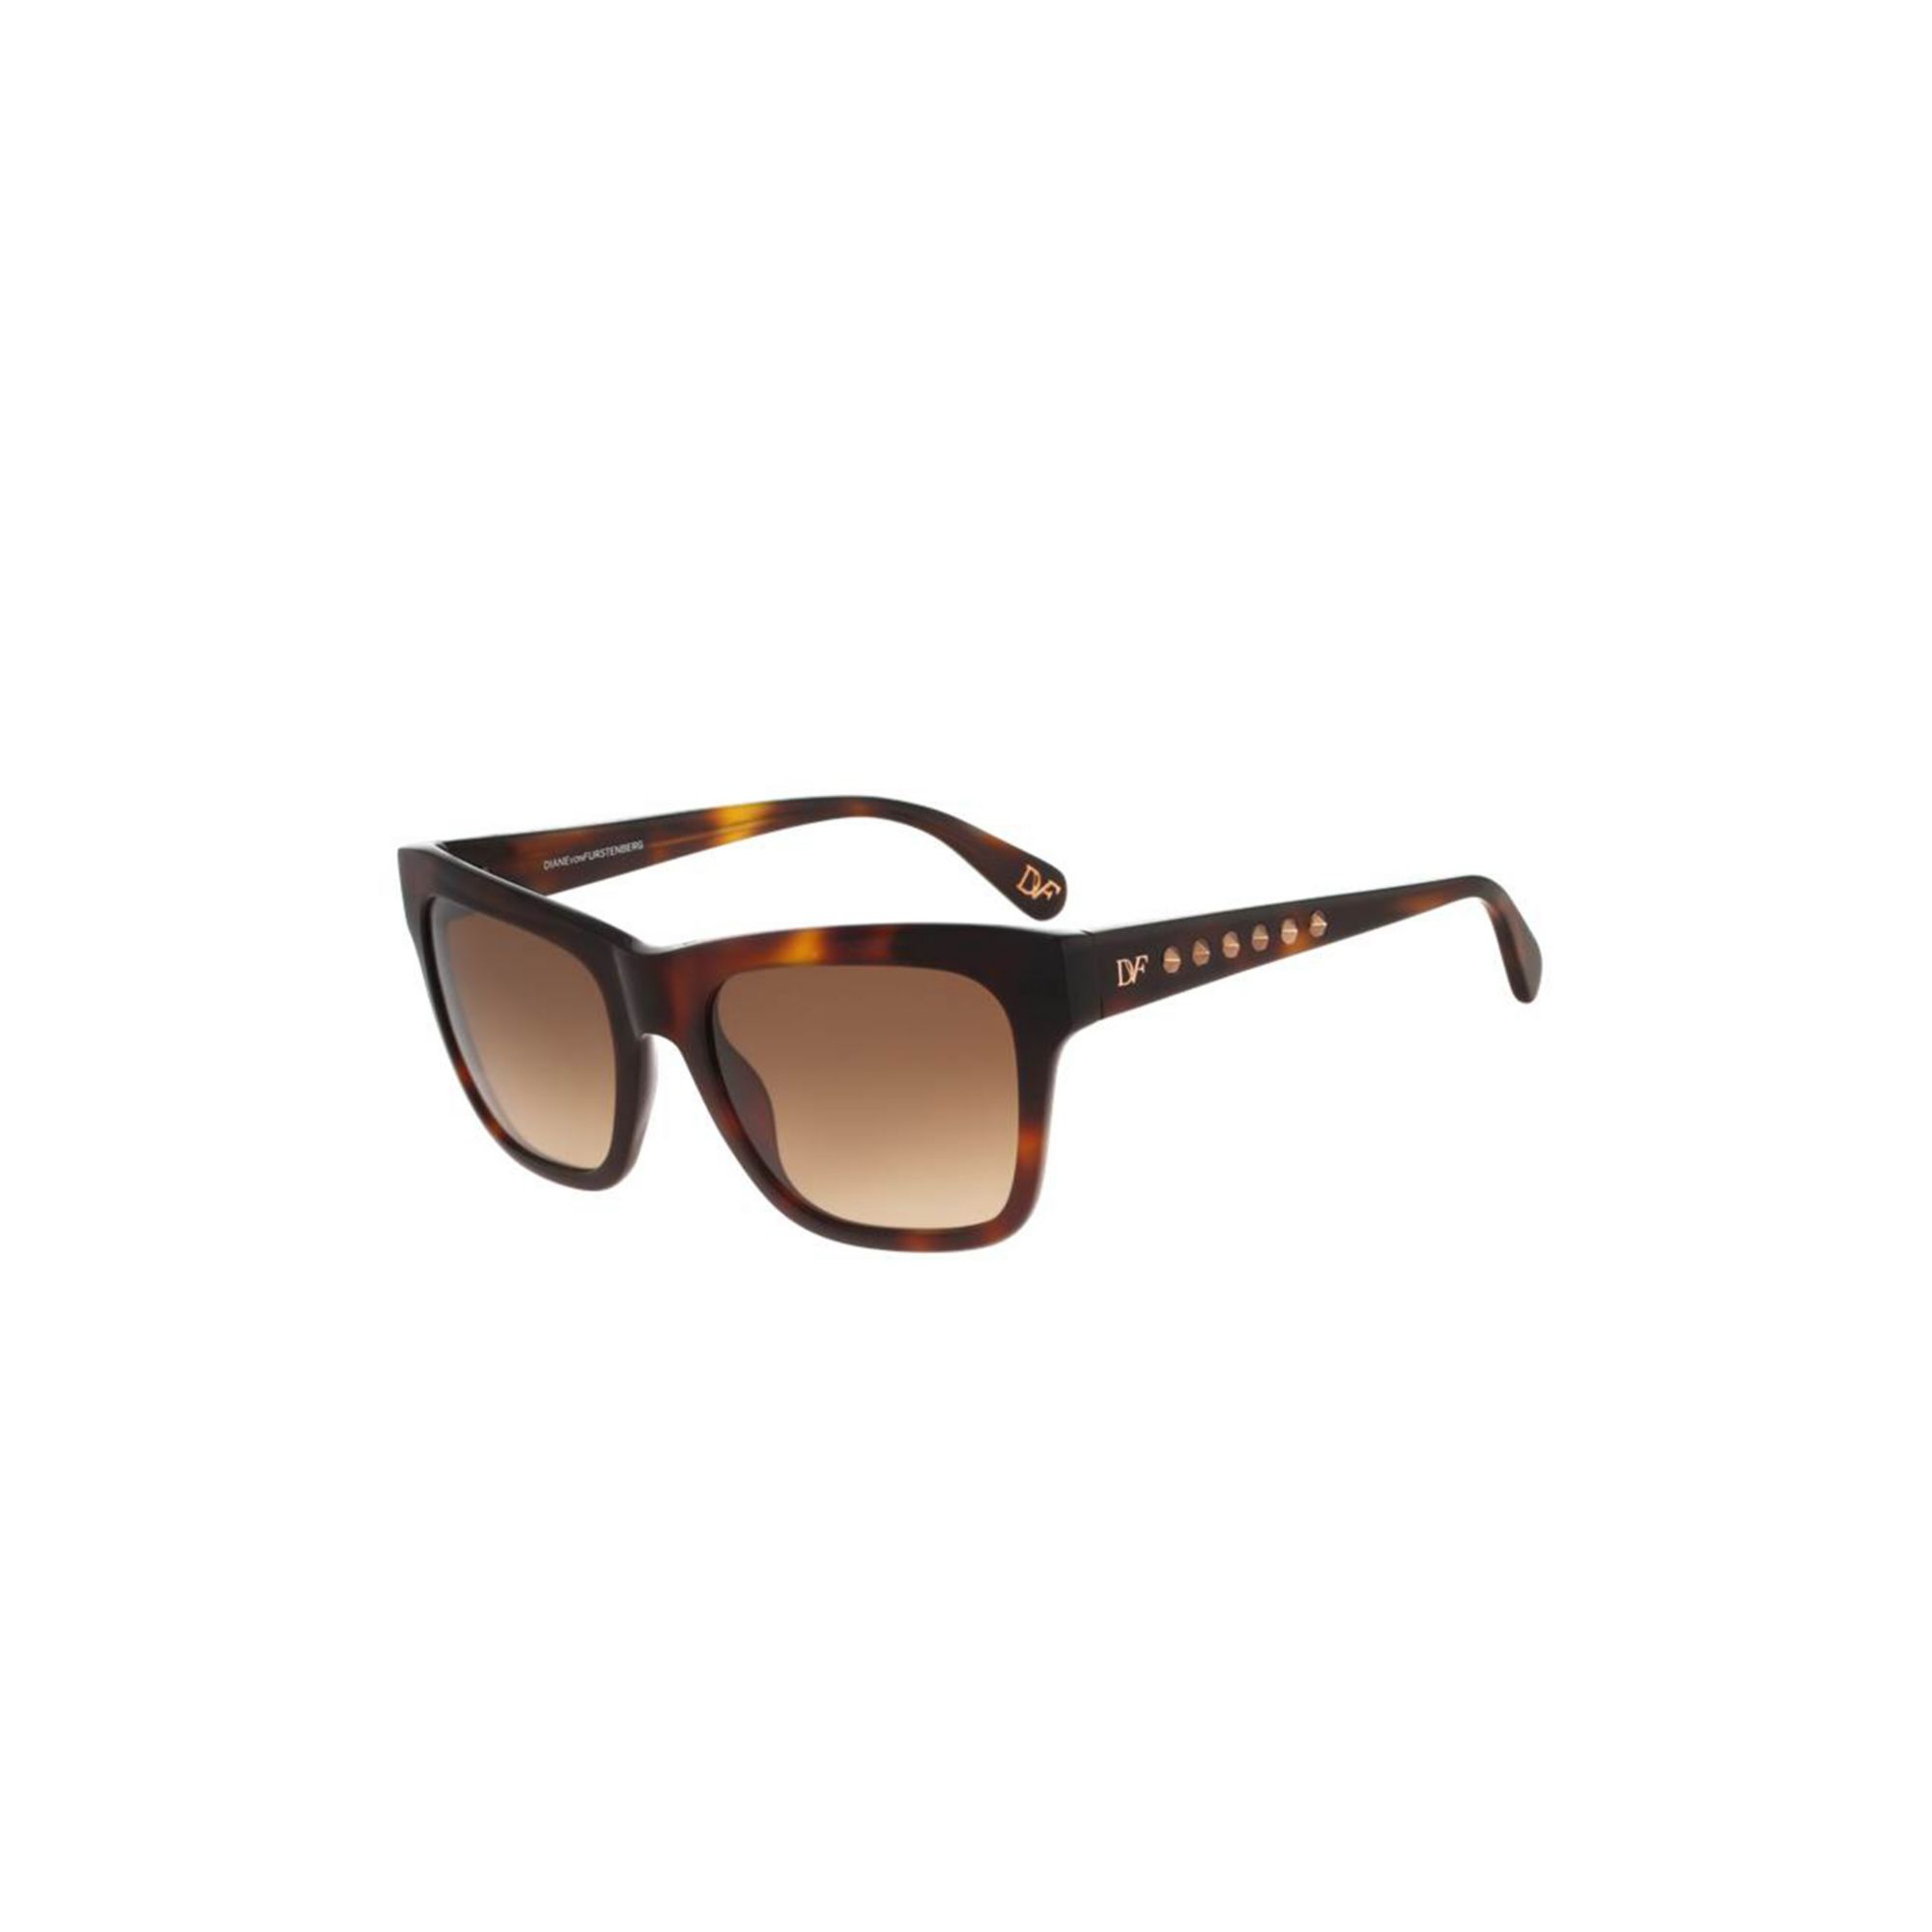 a71fb02421ae8 Diane von Furstenberg Leah Studded Sunglasses in Brown - Lyst